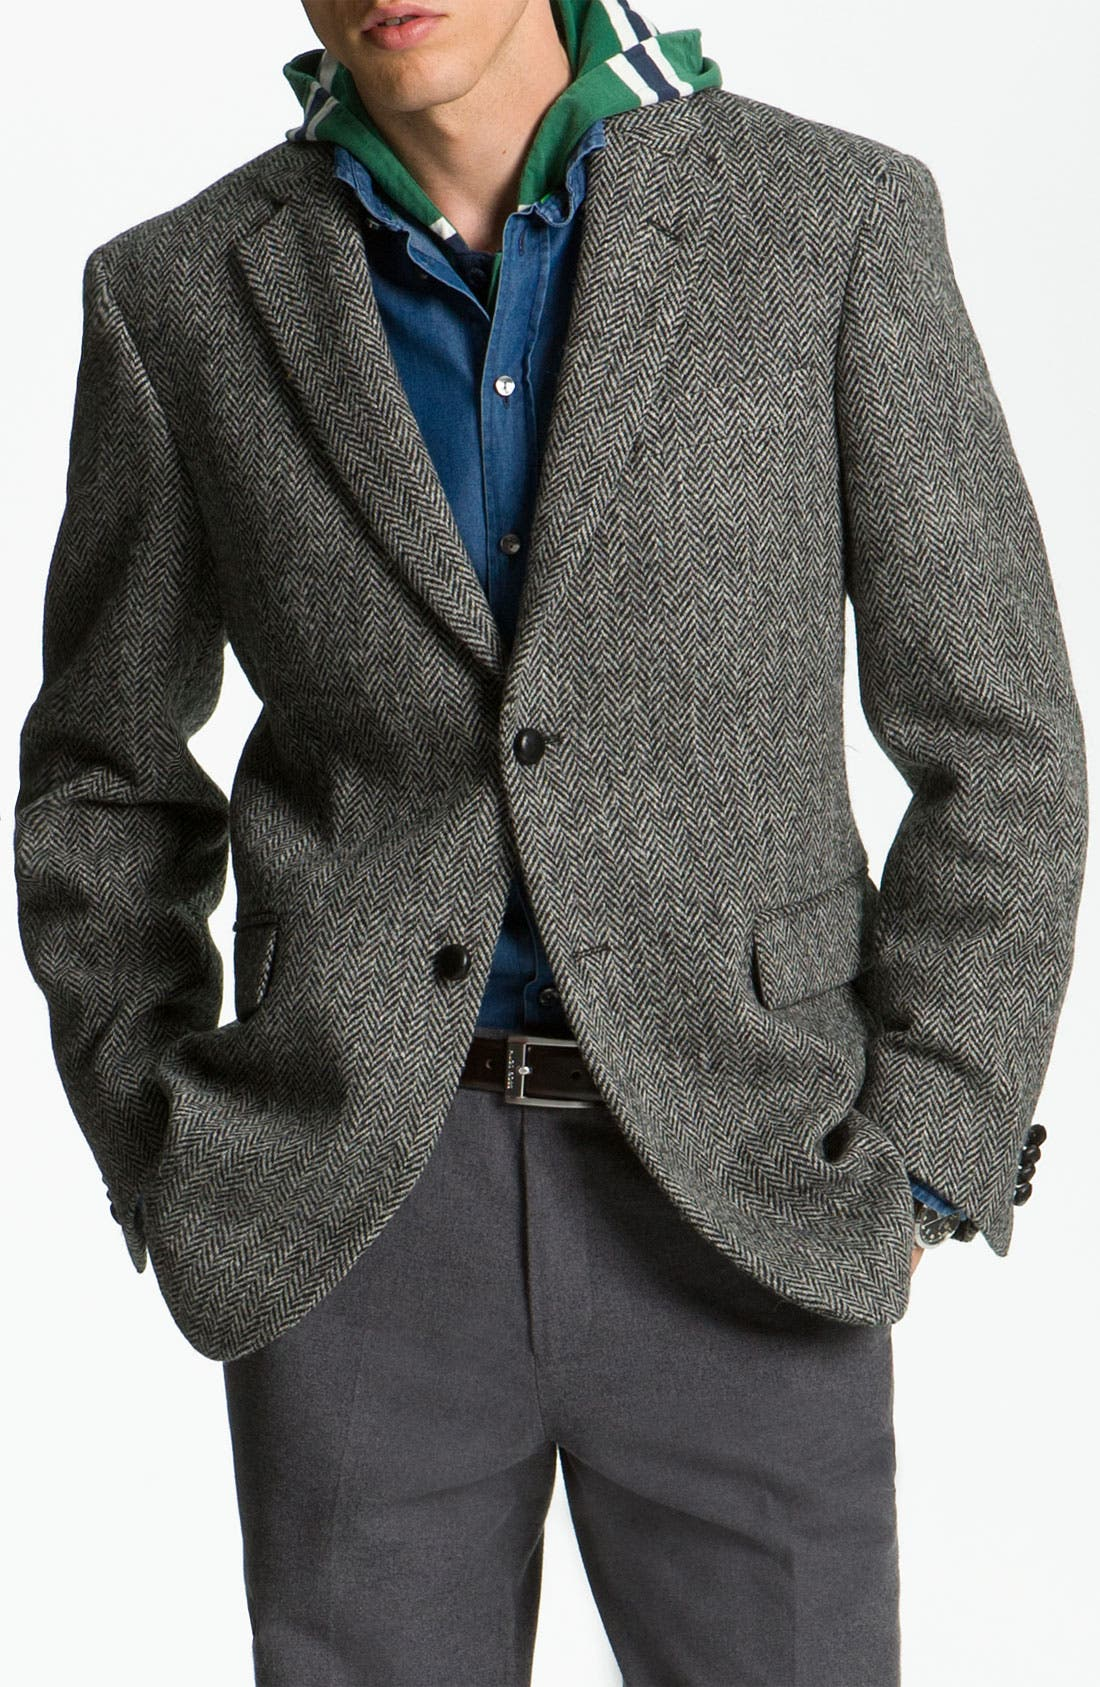 Alternate Image 1 Selected - John W. Nordstrom® Herringbone Sportcoat